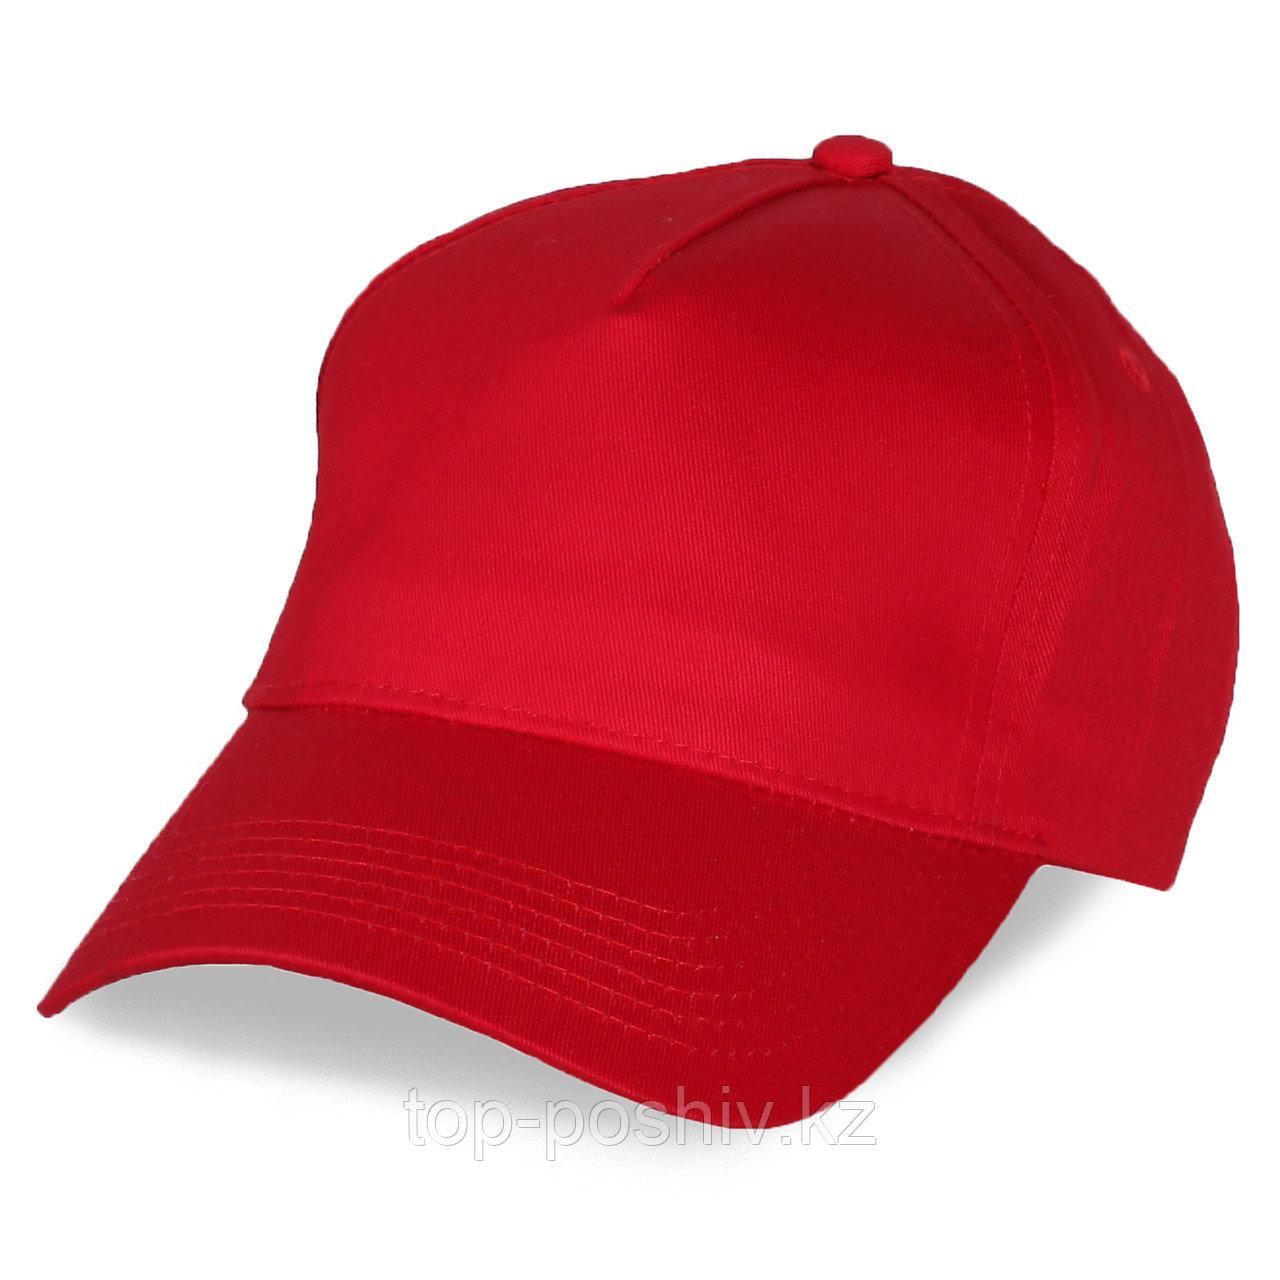 Бейсболка - 100% Х/Б, цвет красный